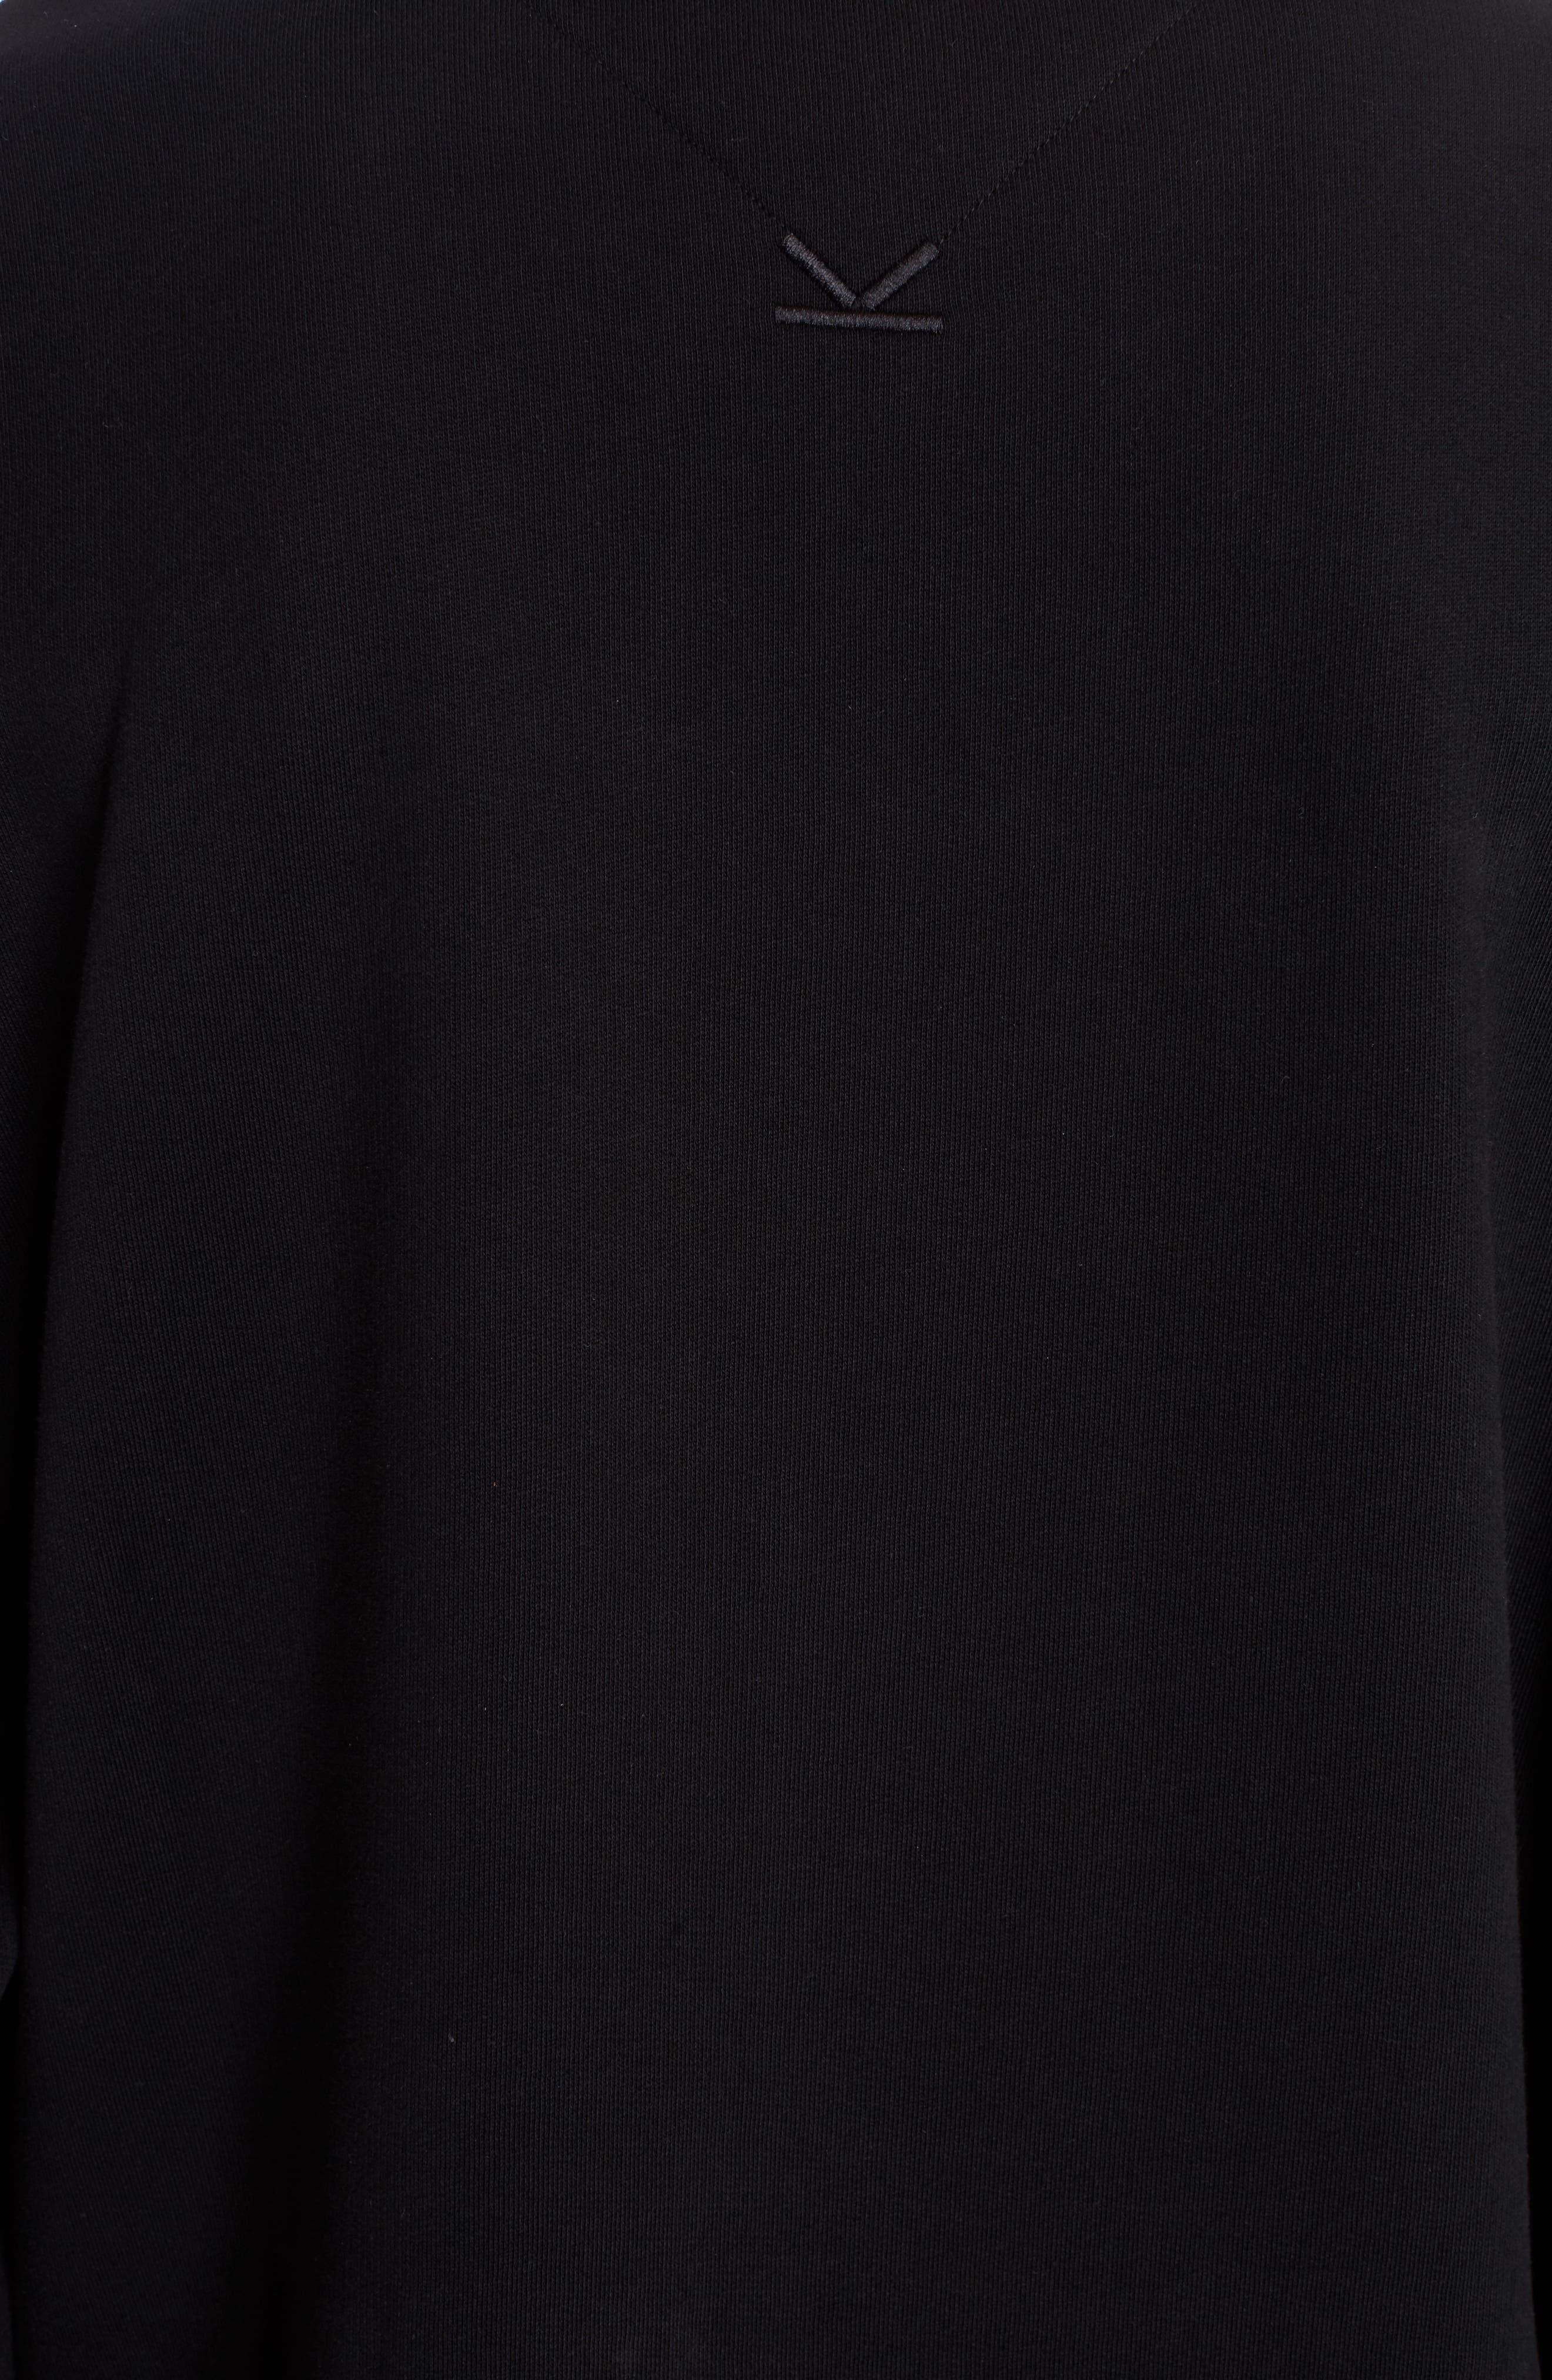 Embroidered Cursive Logo Sweatshirt,                             Alternate thumbnail 5, color,                             001